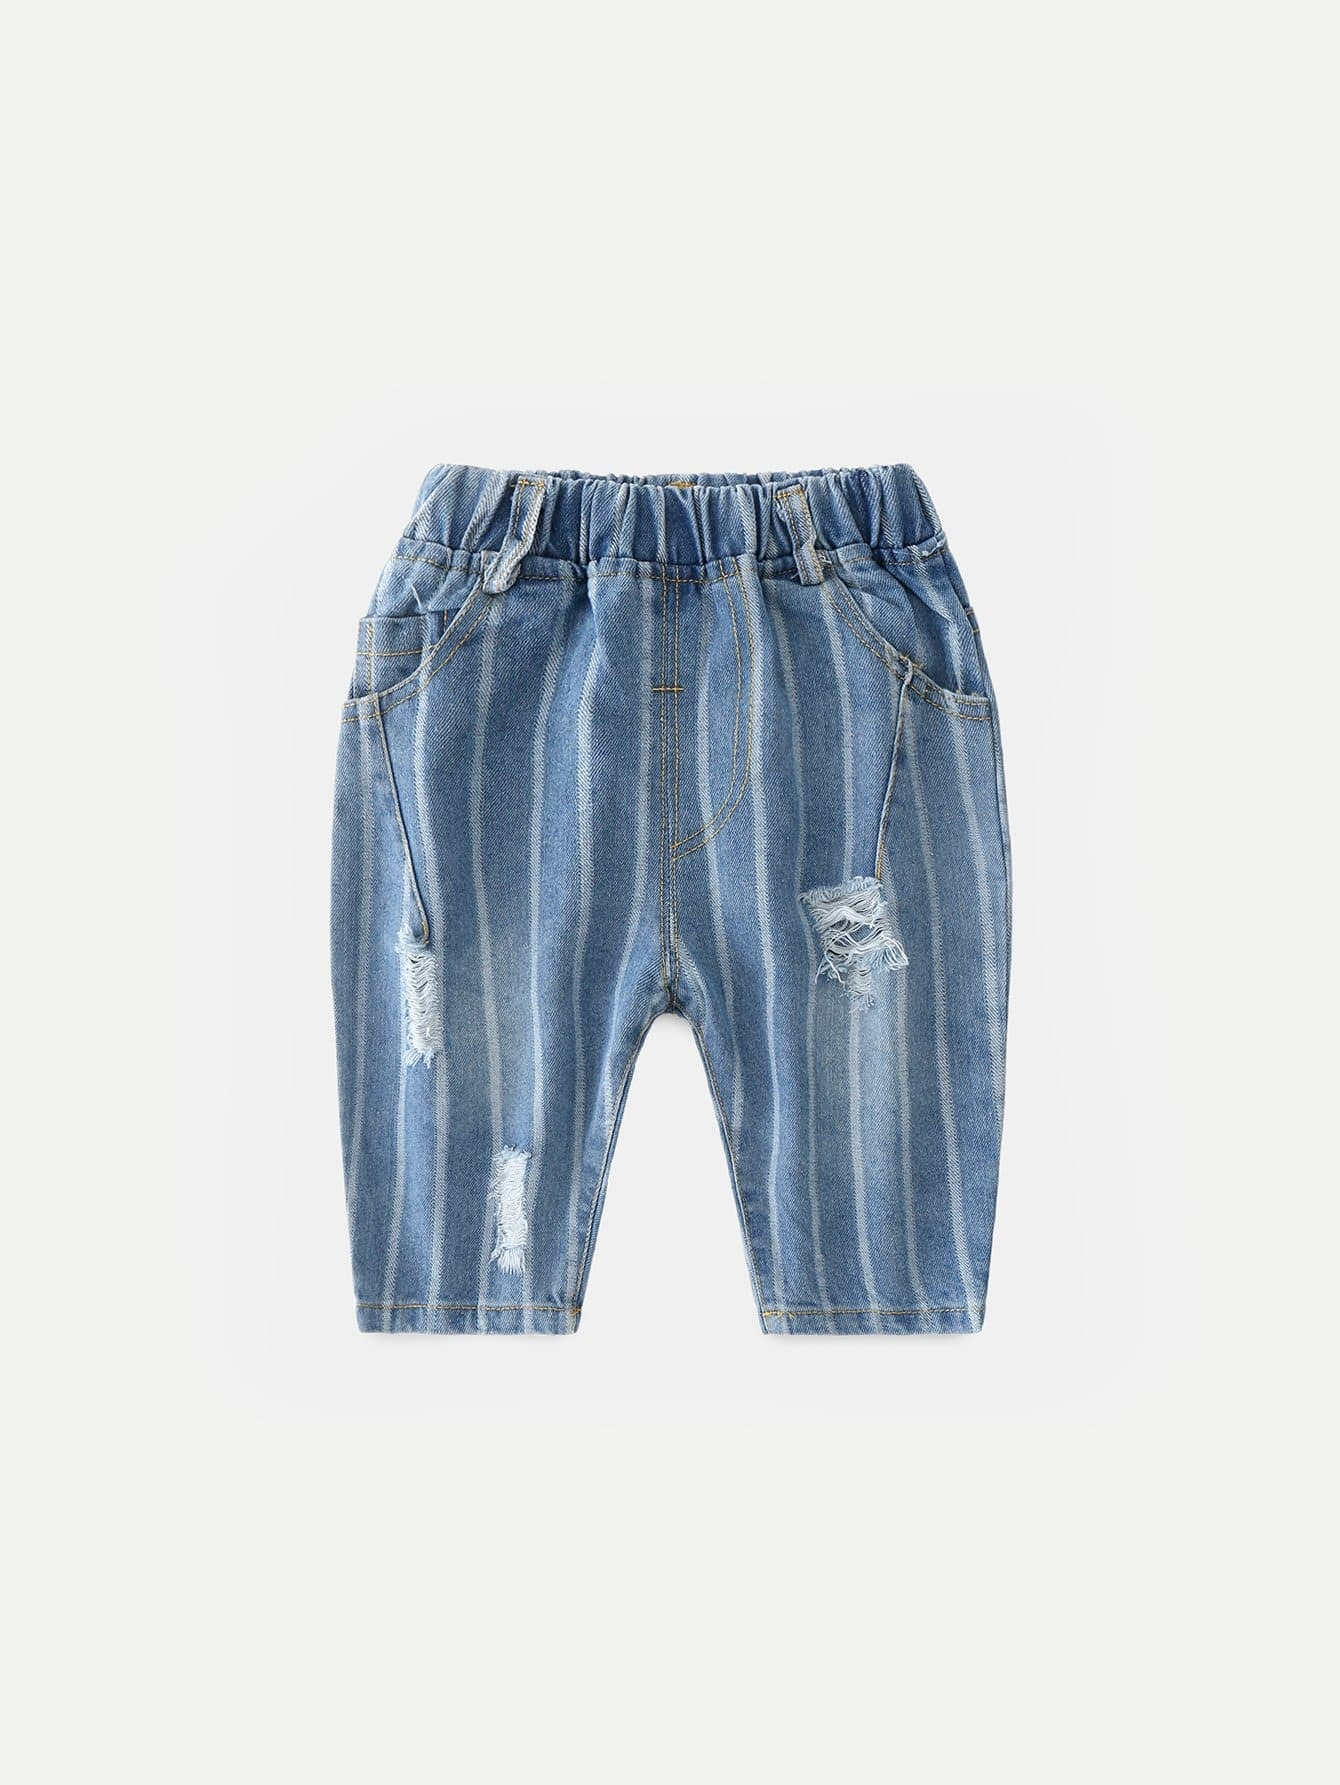 Boys Striped Destroyed Jeans цена 2017